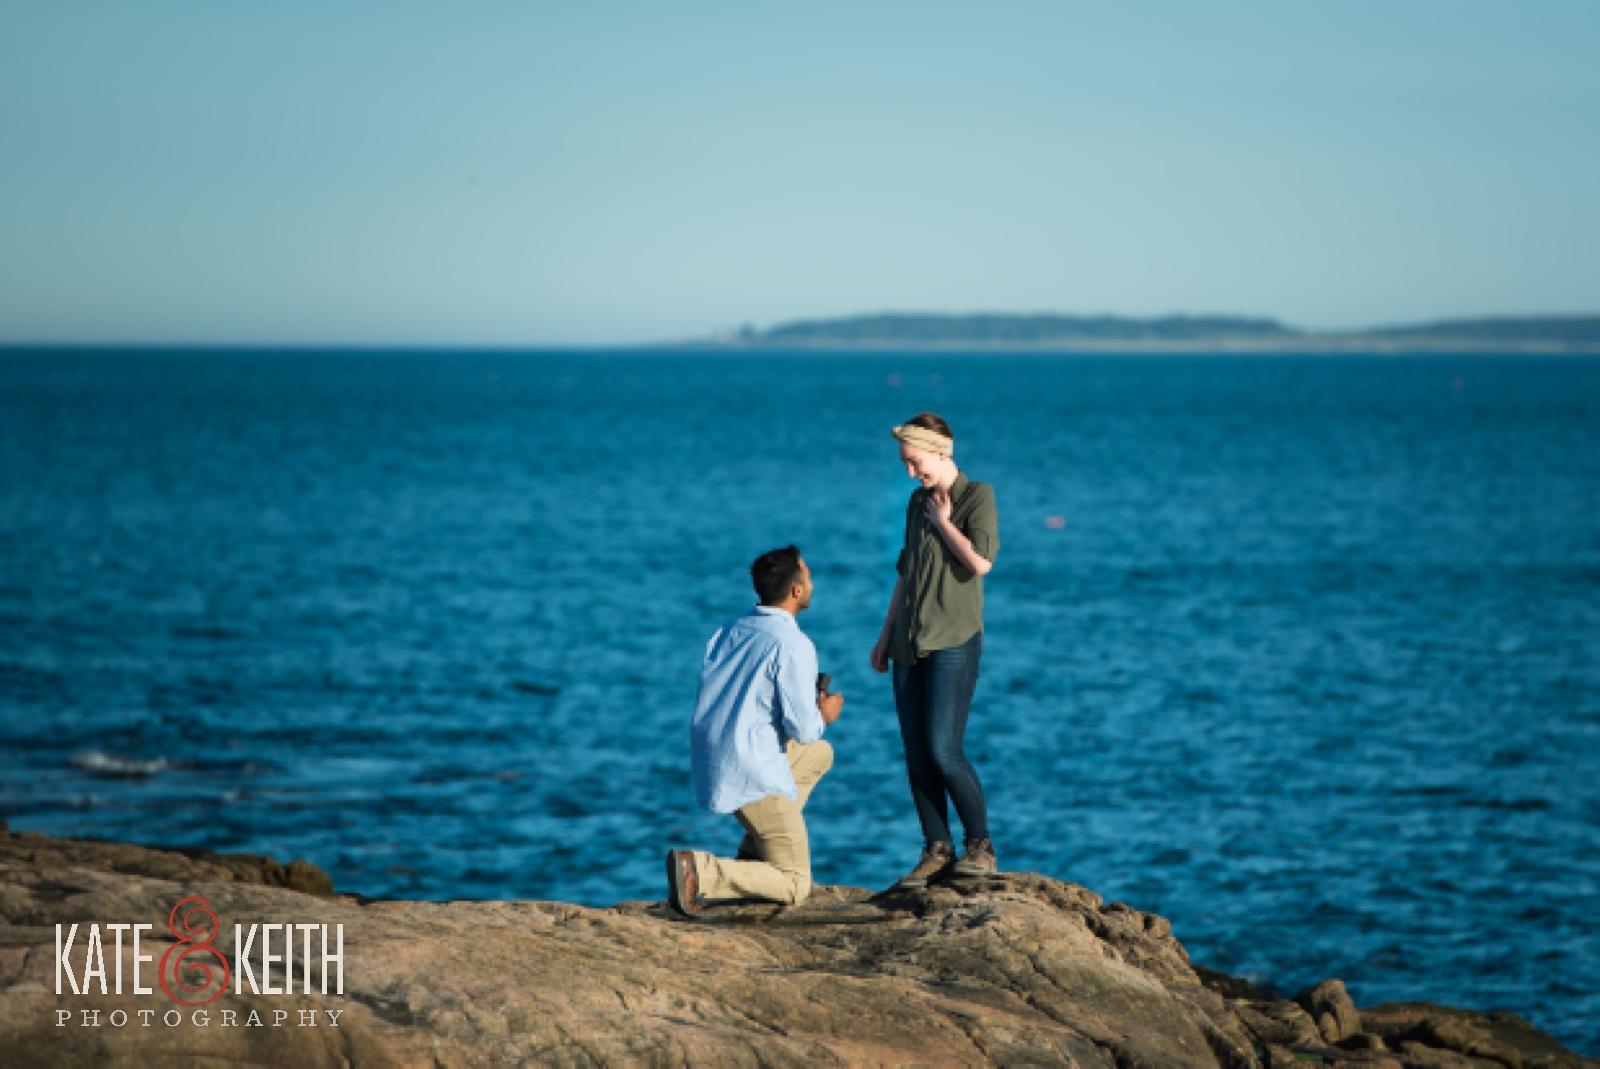 Man proposing to woman in Acadia National Park, engagement, water, ocean, sea, seaside, surprise proposal, surprise wedding proposal, rocky coast, Maine, sunset